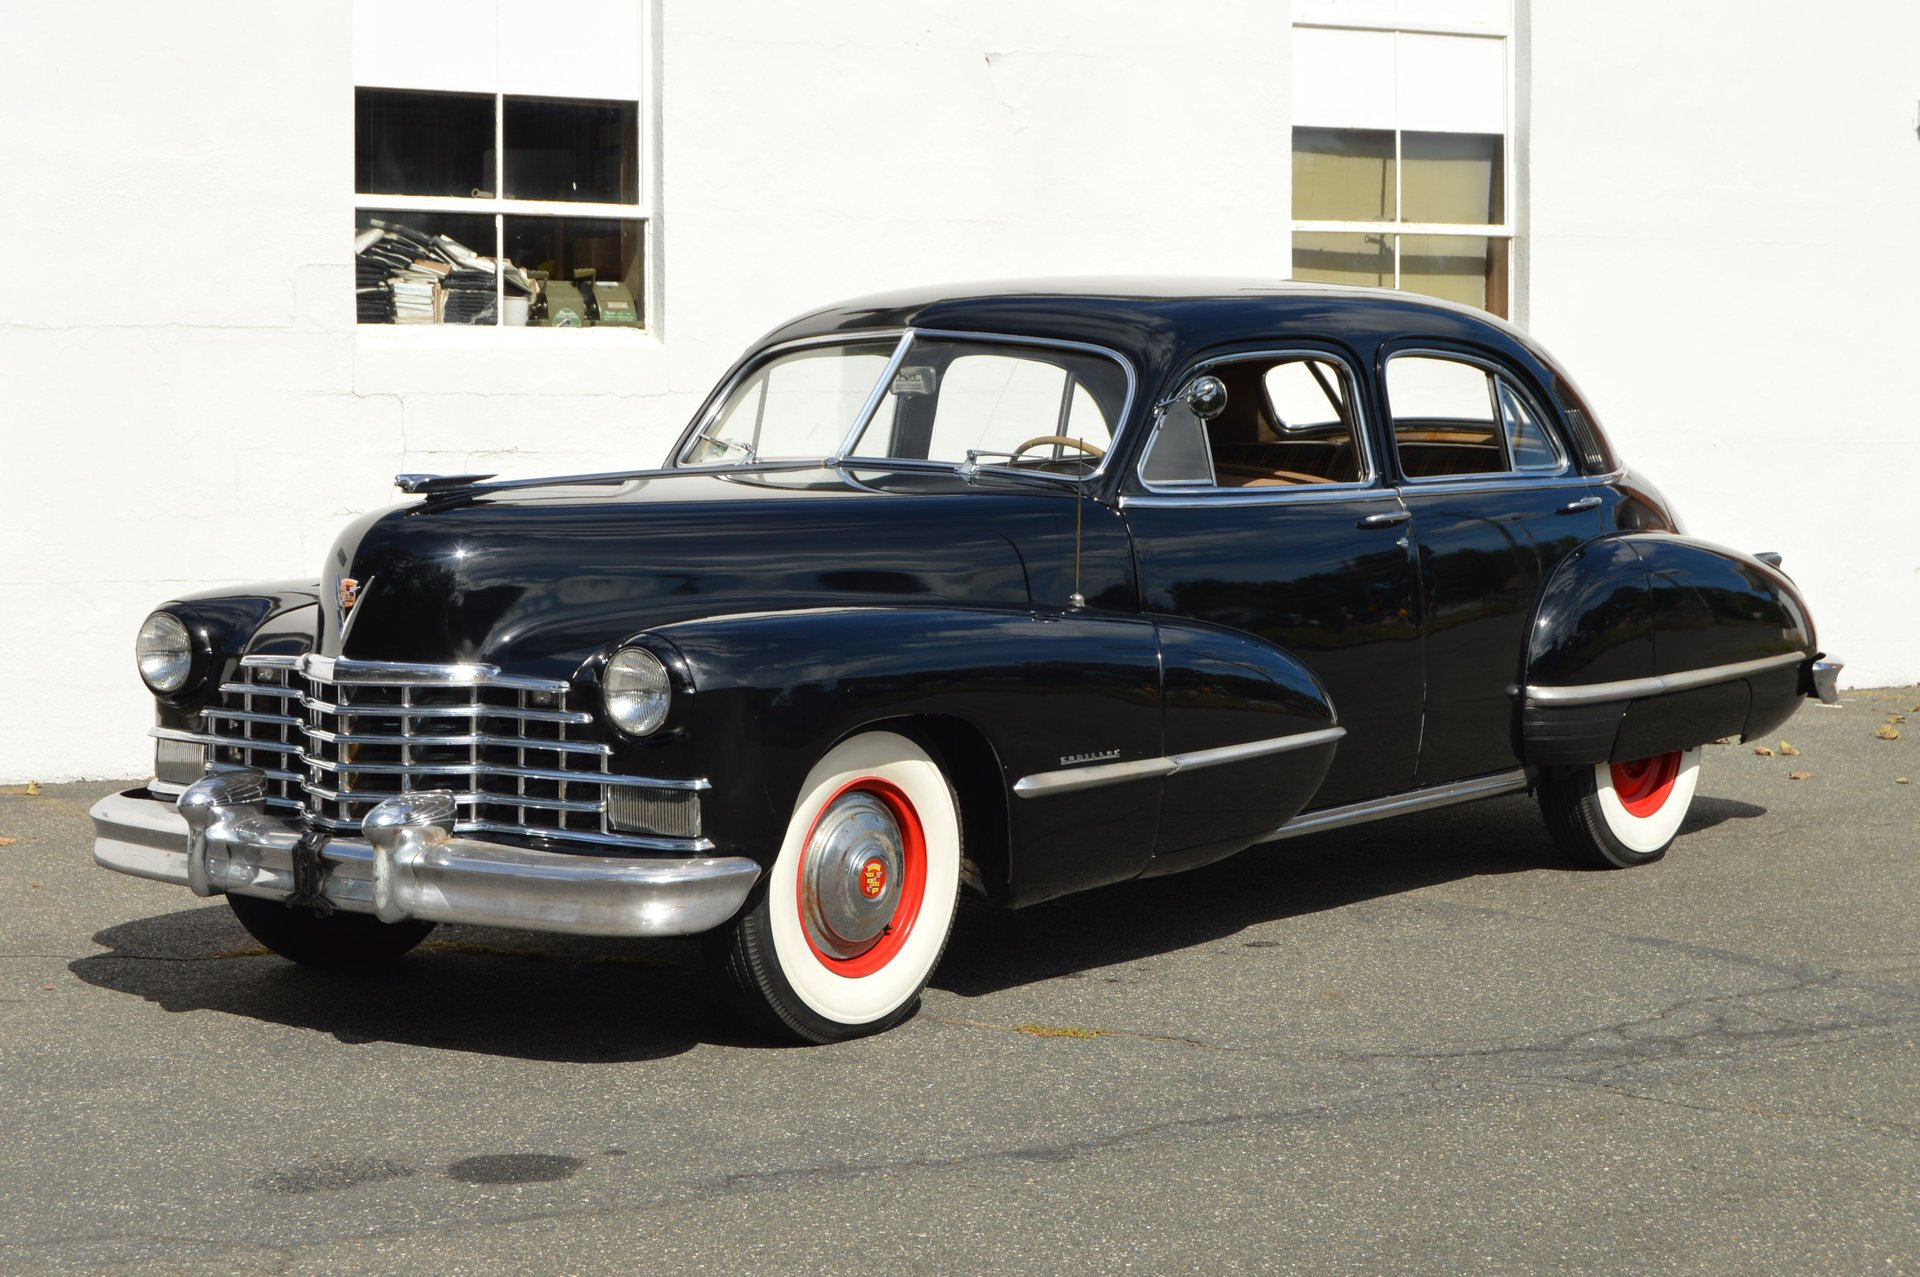 1946 cadillac fleetwood model 60